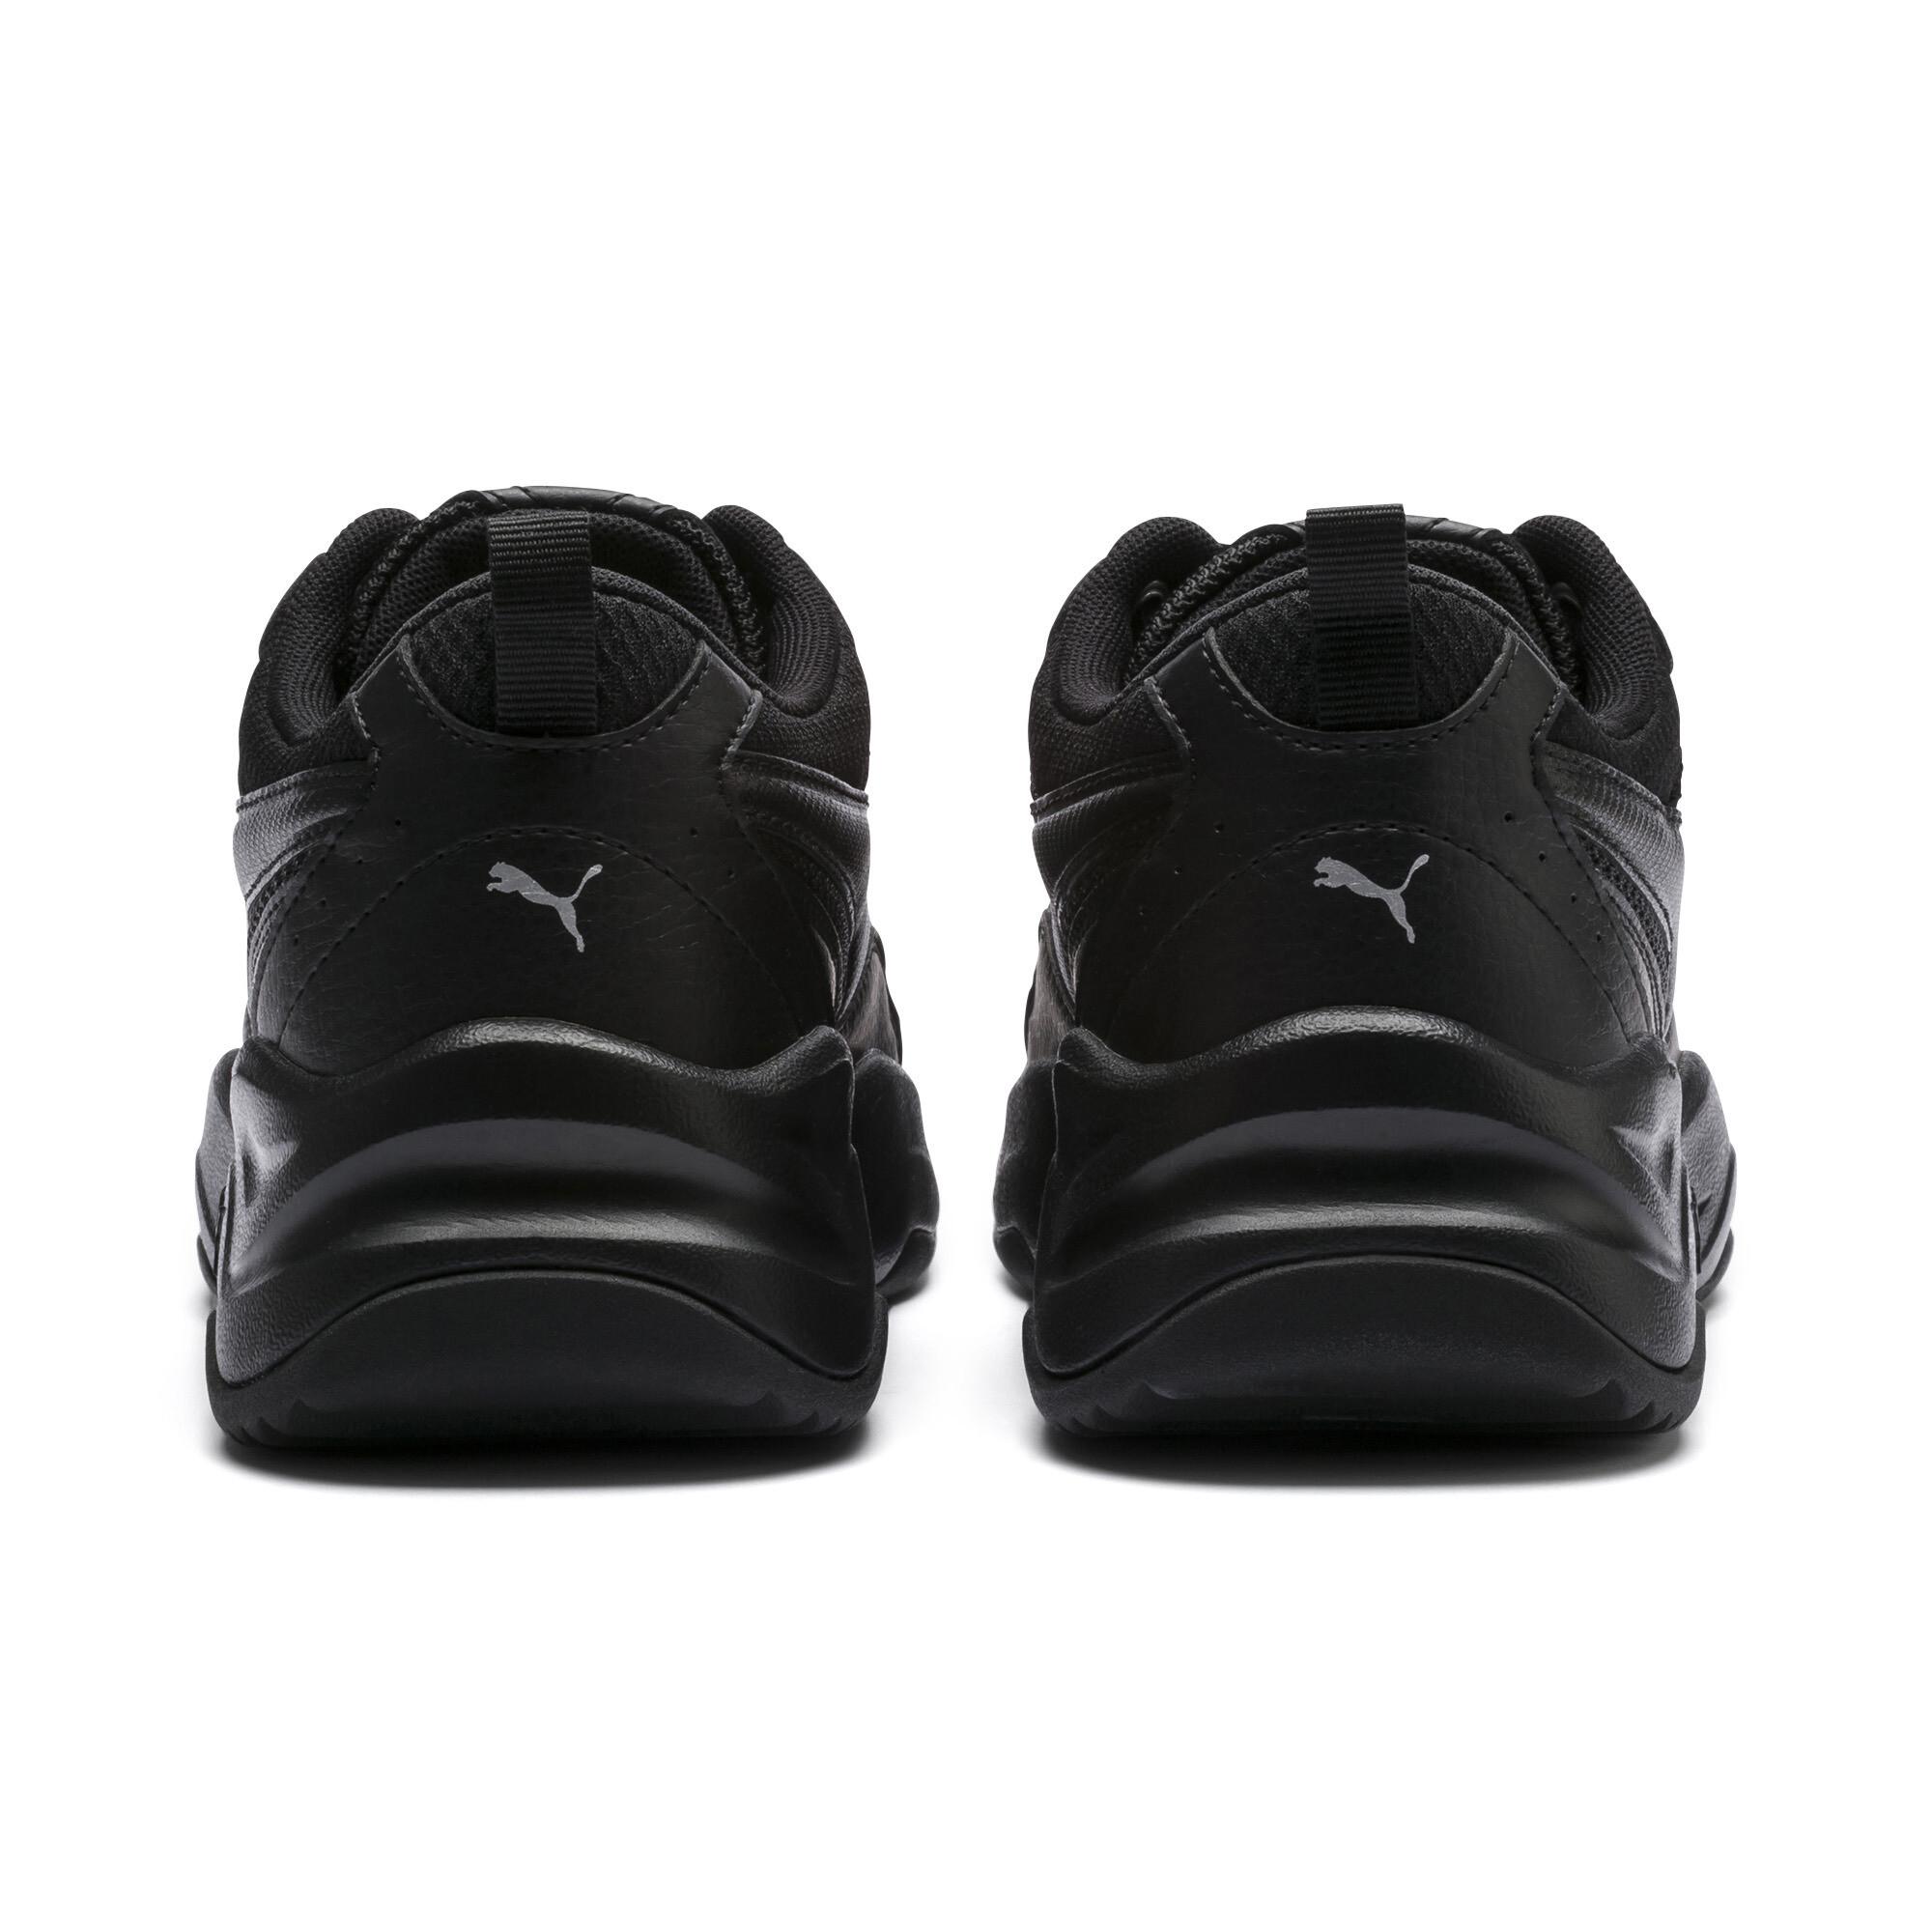 PUMA-Cilia-Women-039-s-Sneakers-Women-Shoe-Basics thumbnail 9